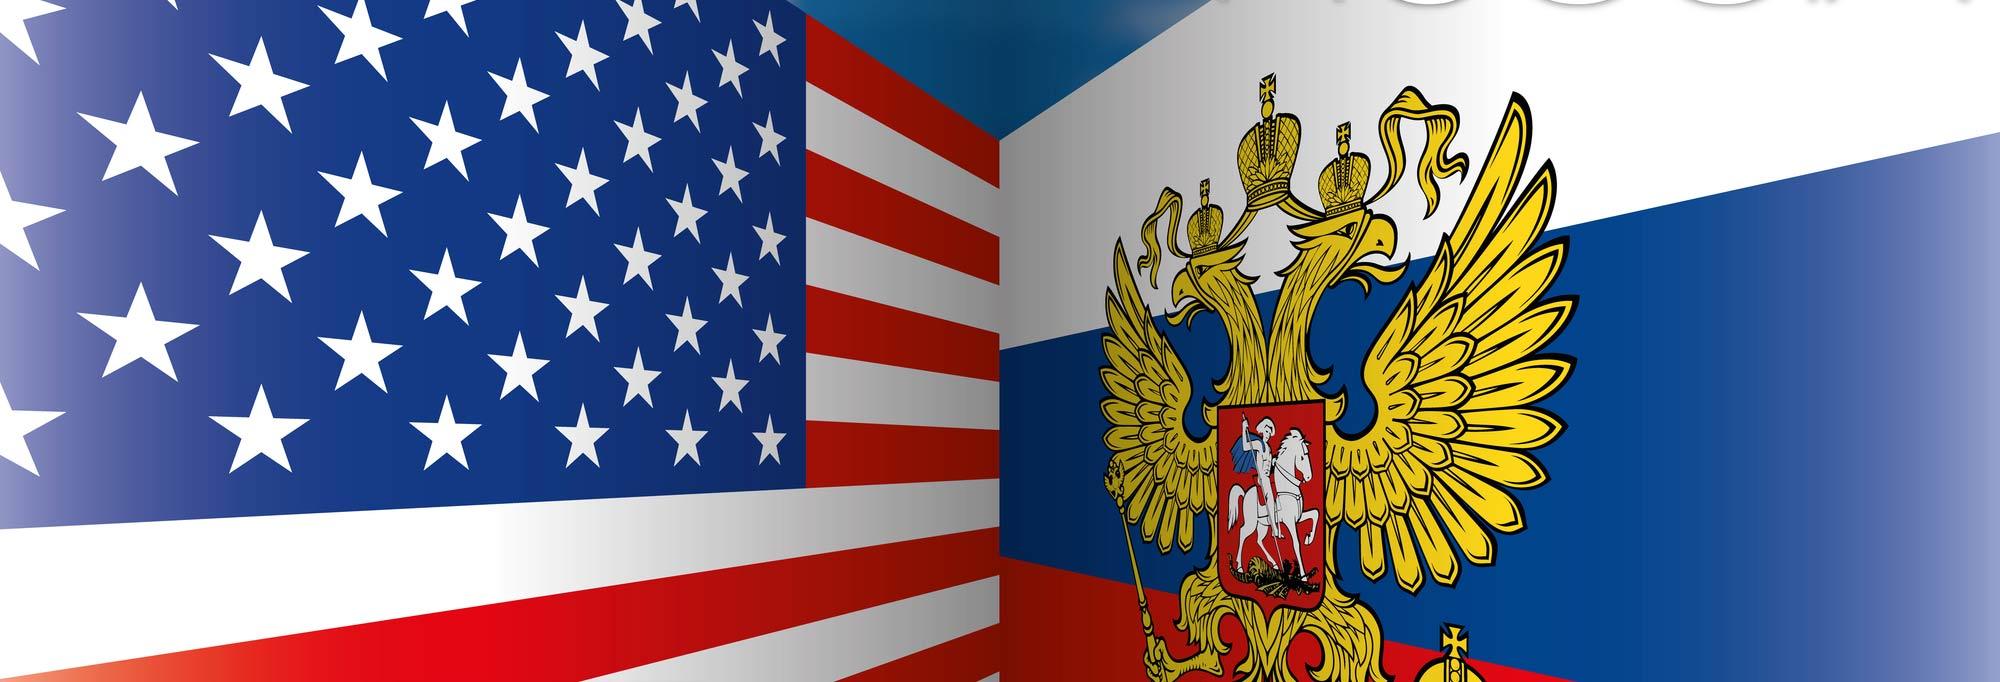 Obama-VS-Putin-strategy-(2)